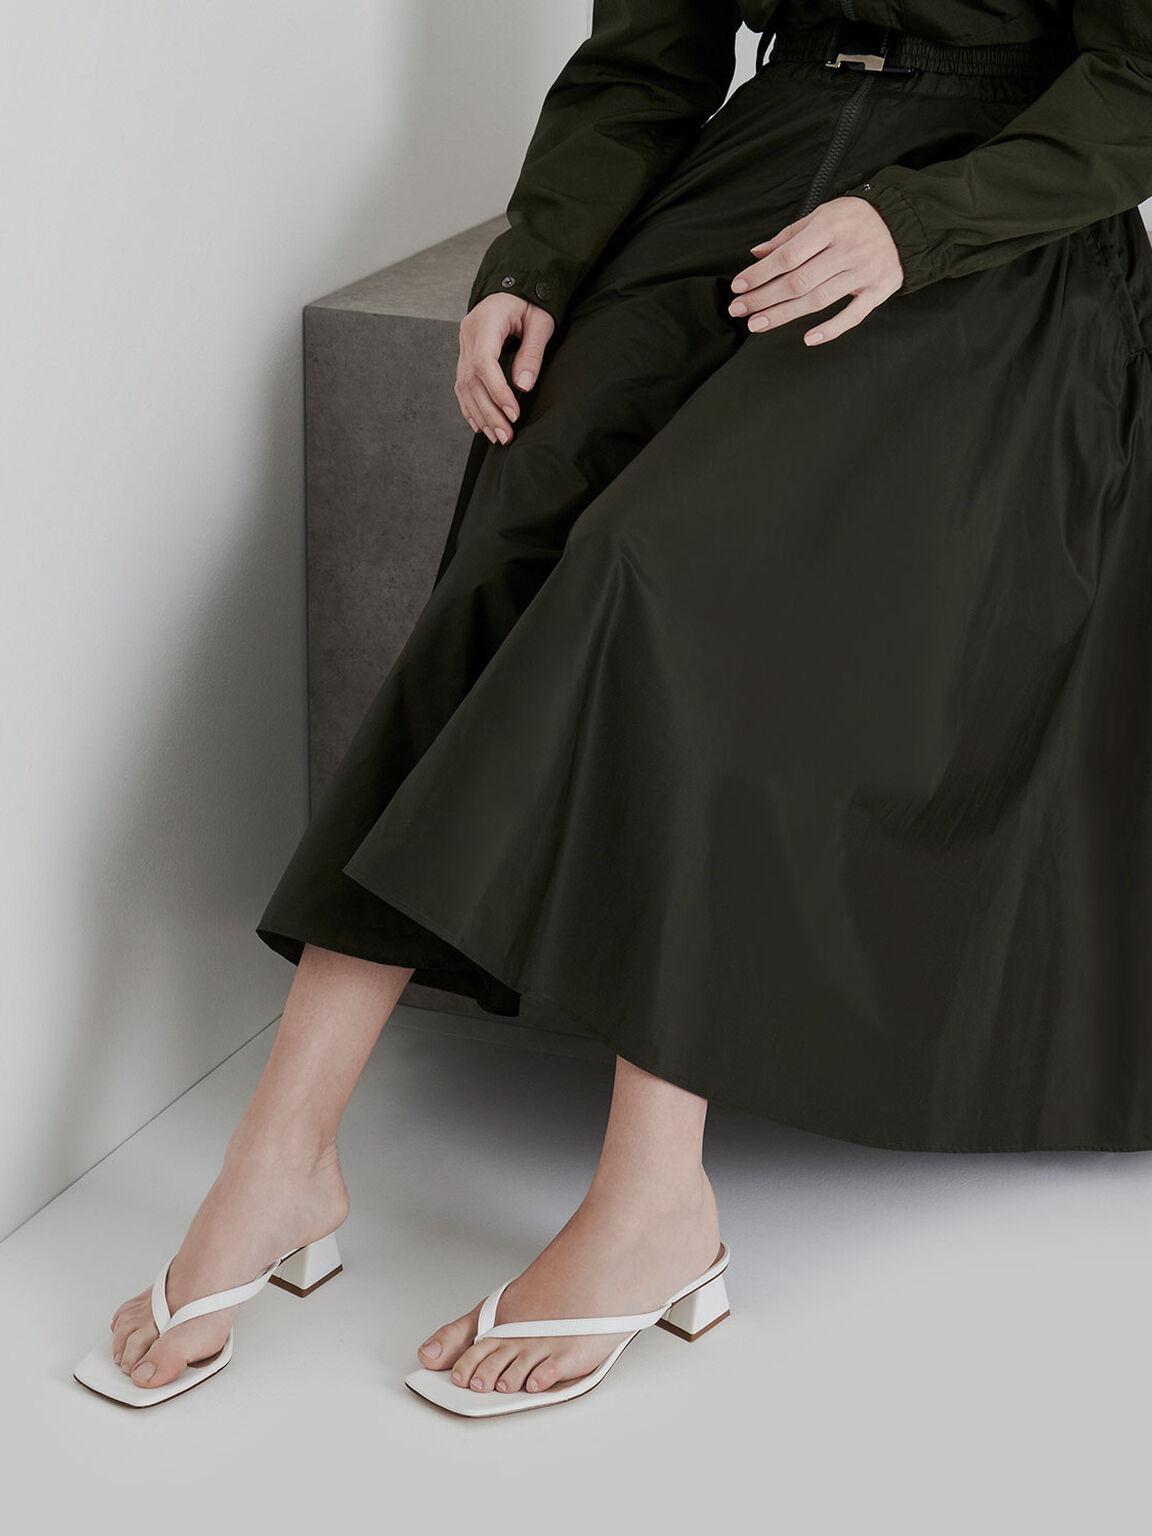 Thong Heeled Sandals, White, hi-res